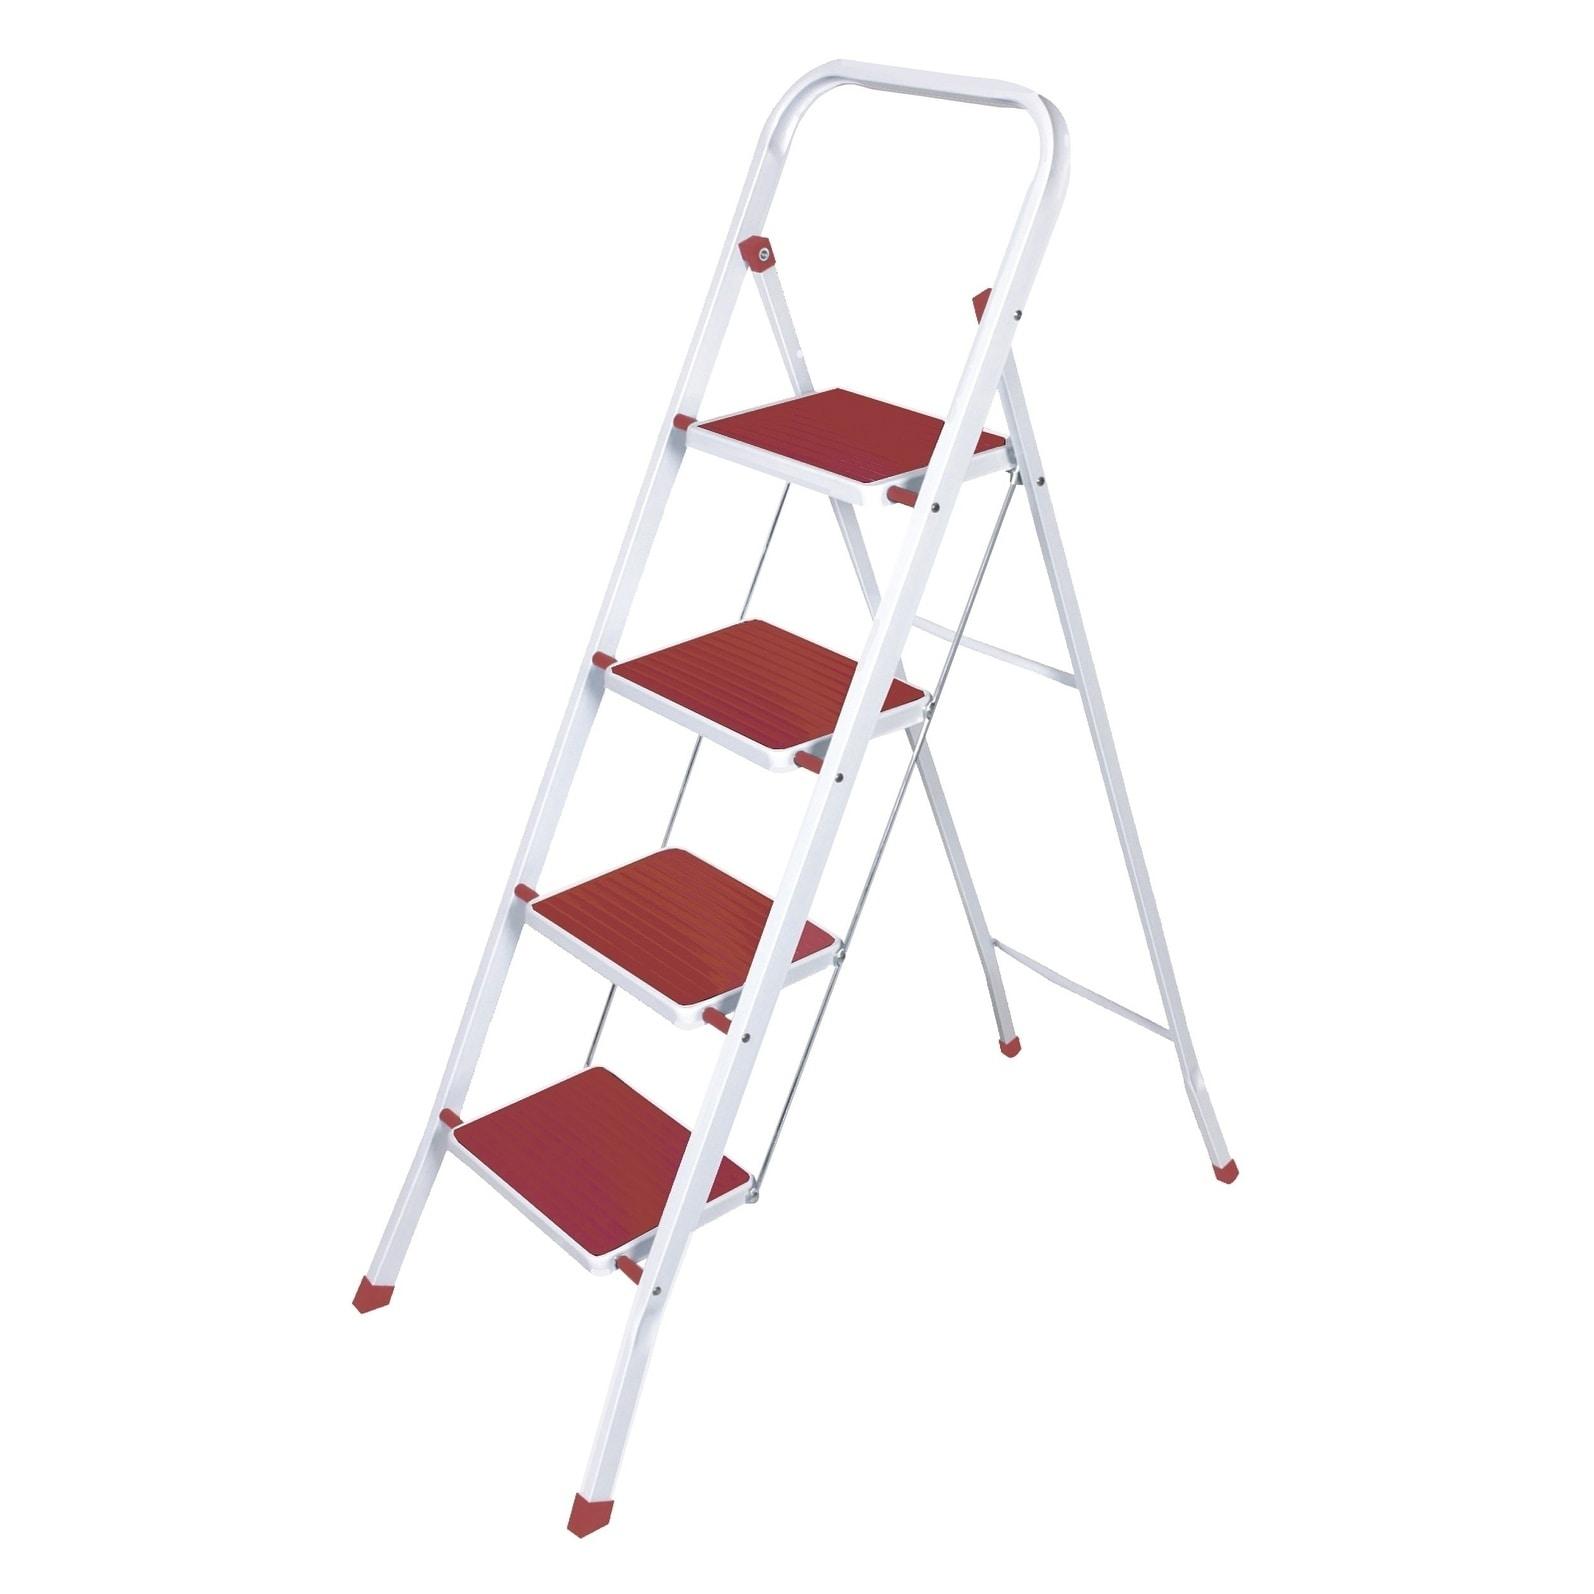 wee's beyond heavy duty red nonslip 4 step ladder